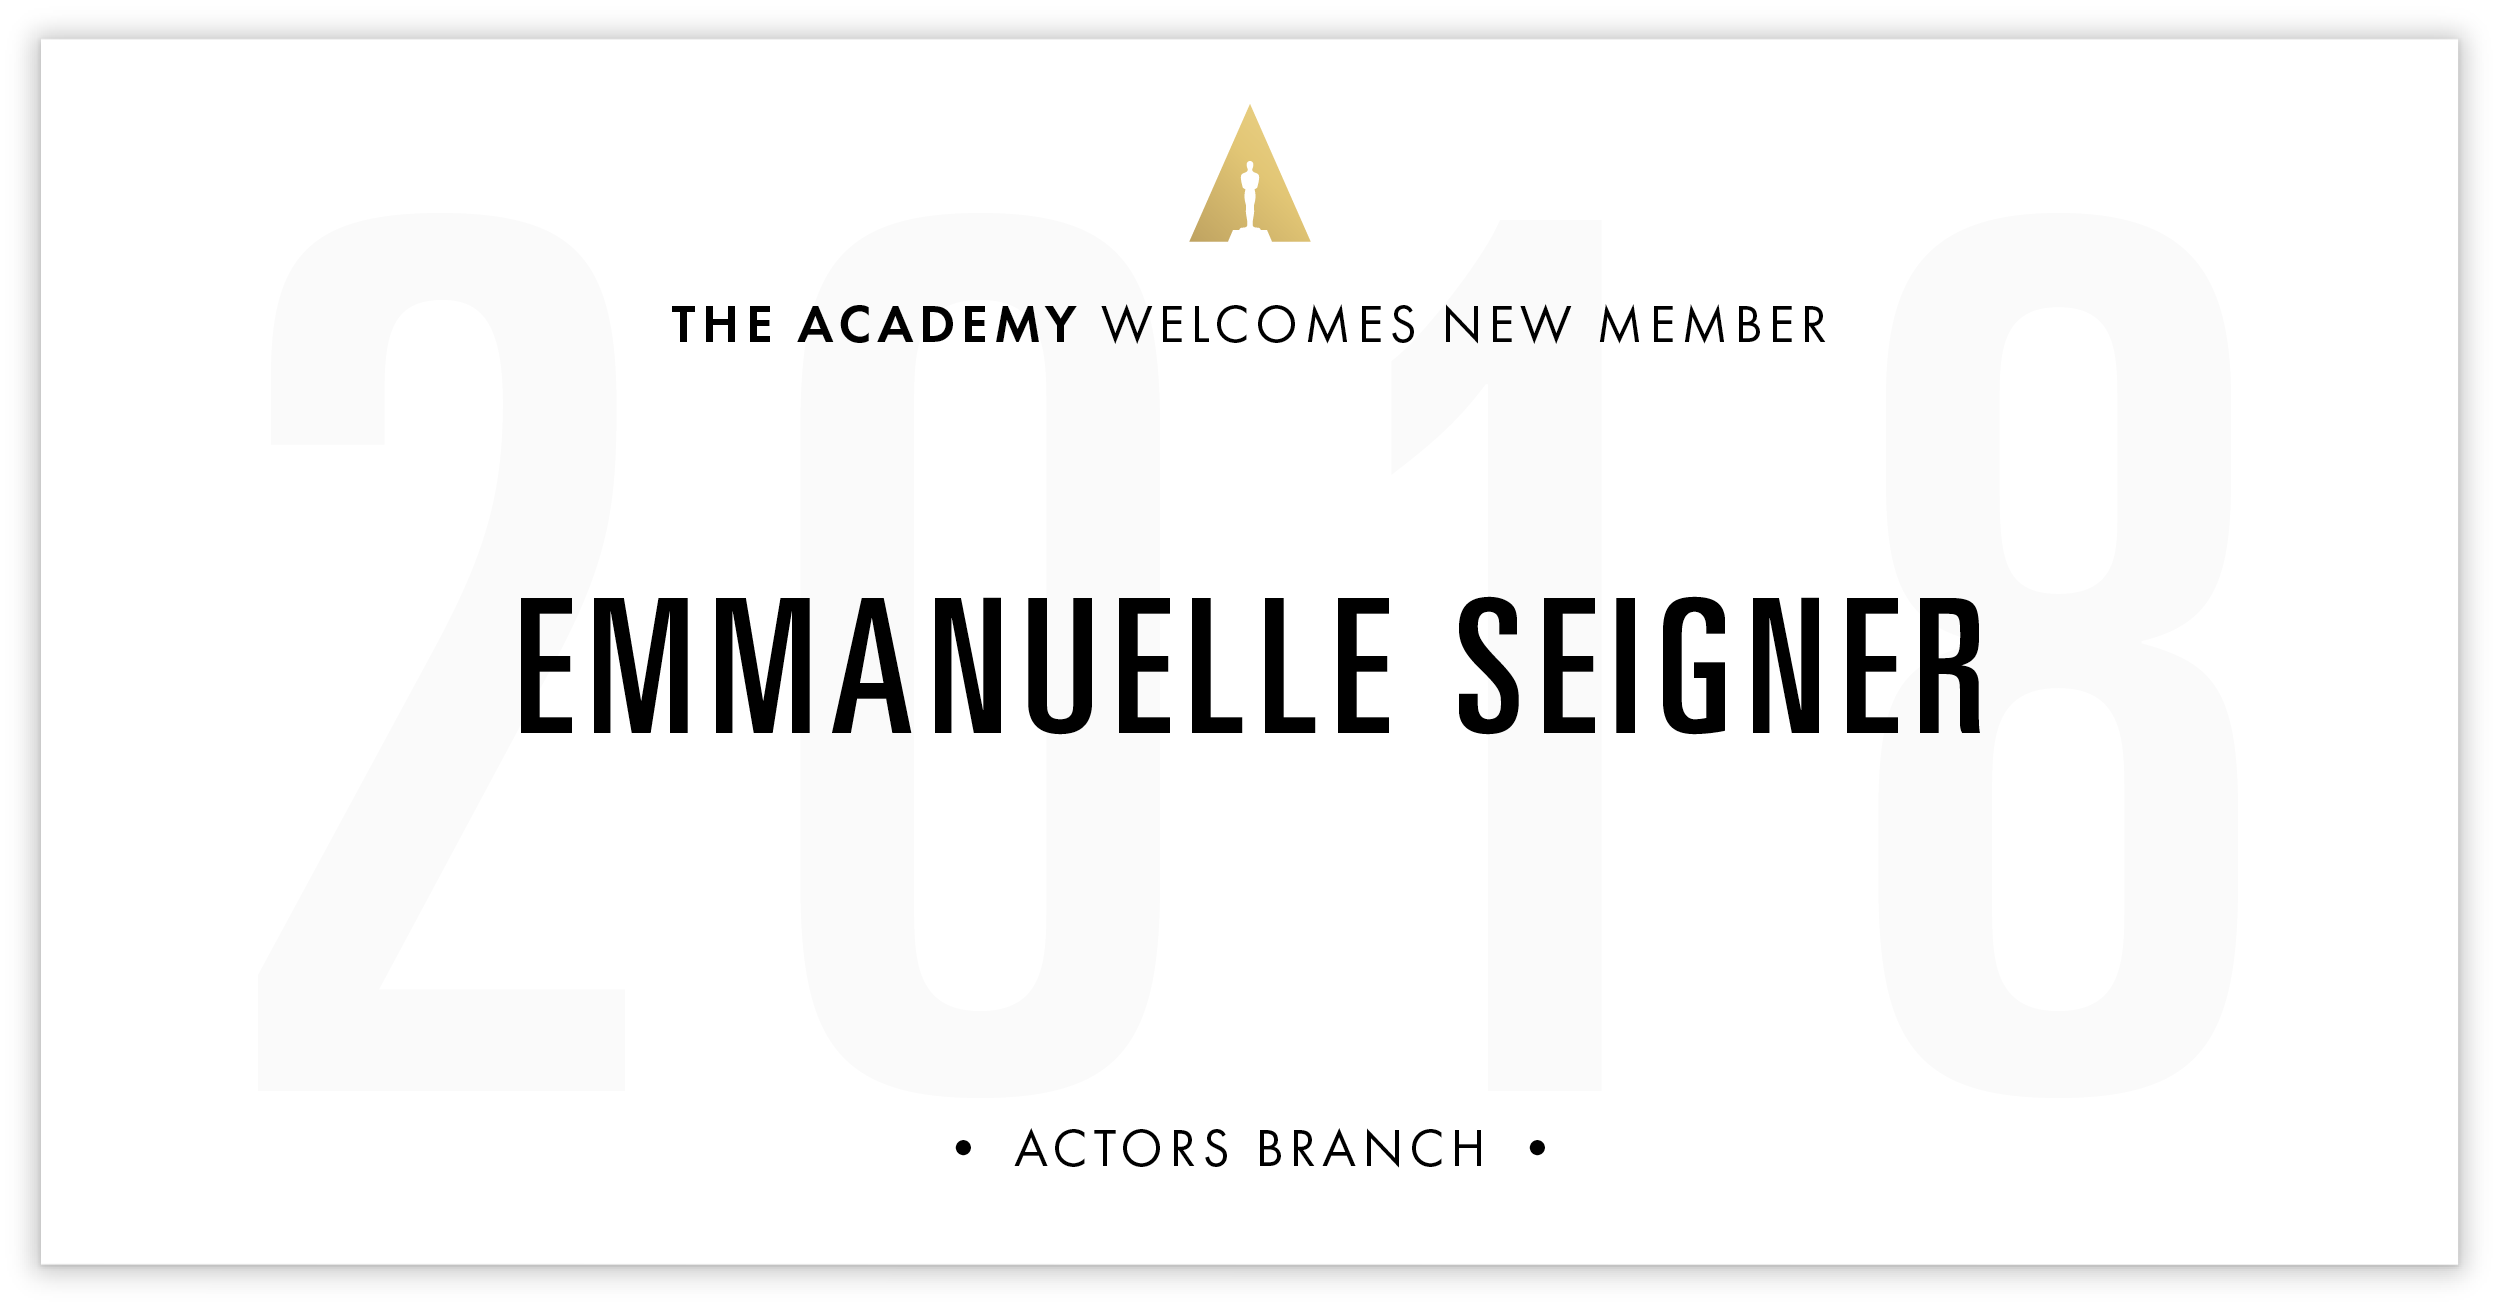 Emmanuelle Seigner is invited!